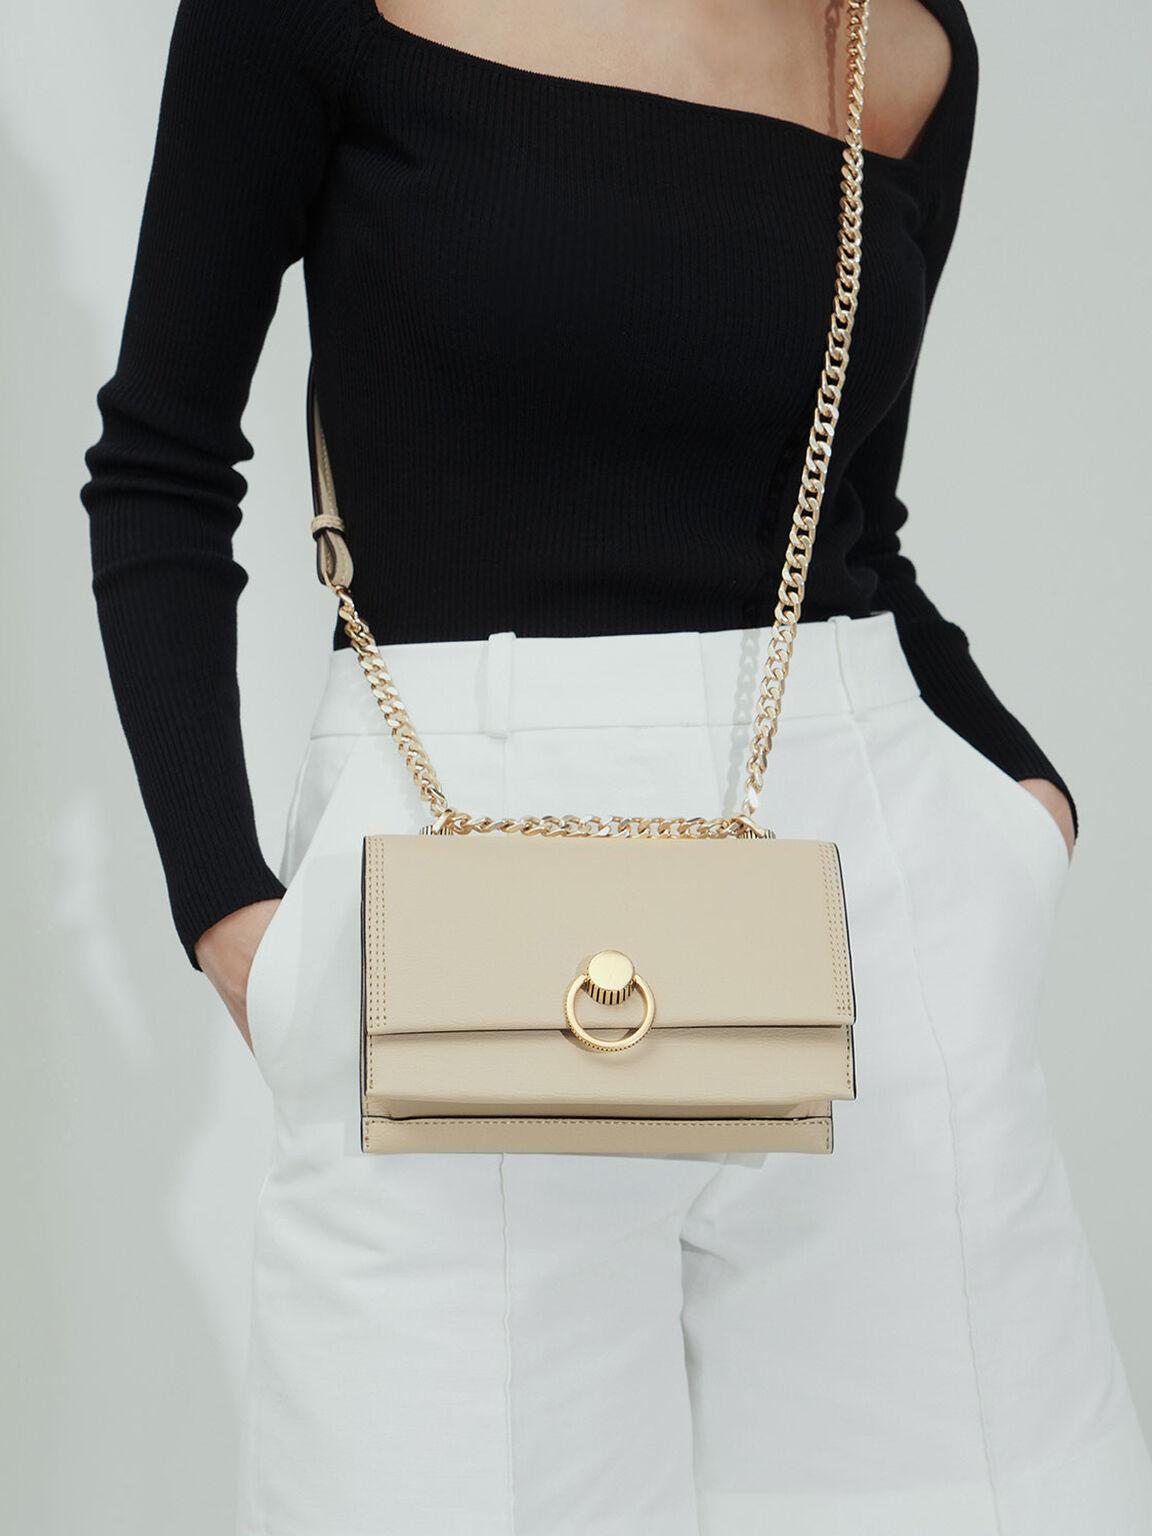 Ring Push-Lock Shoulder Bag, Ivory, hi-res